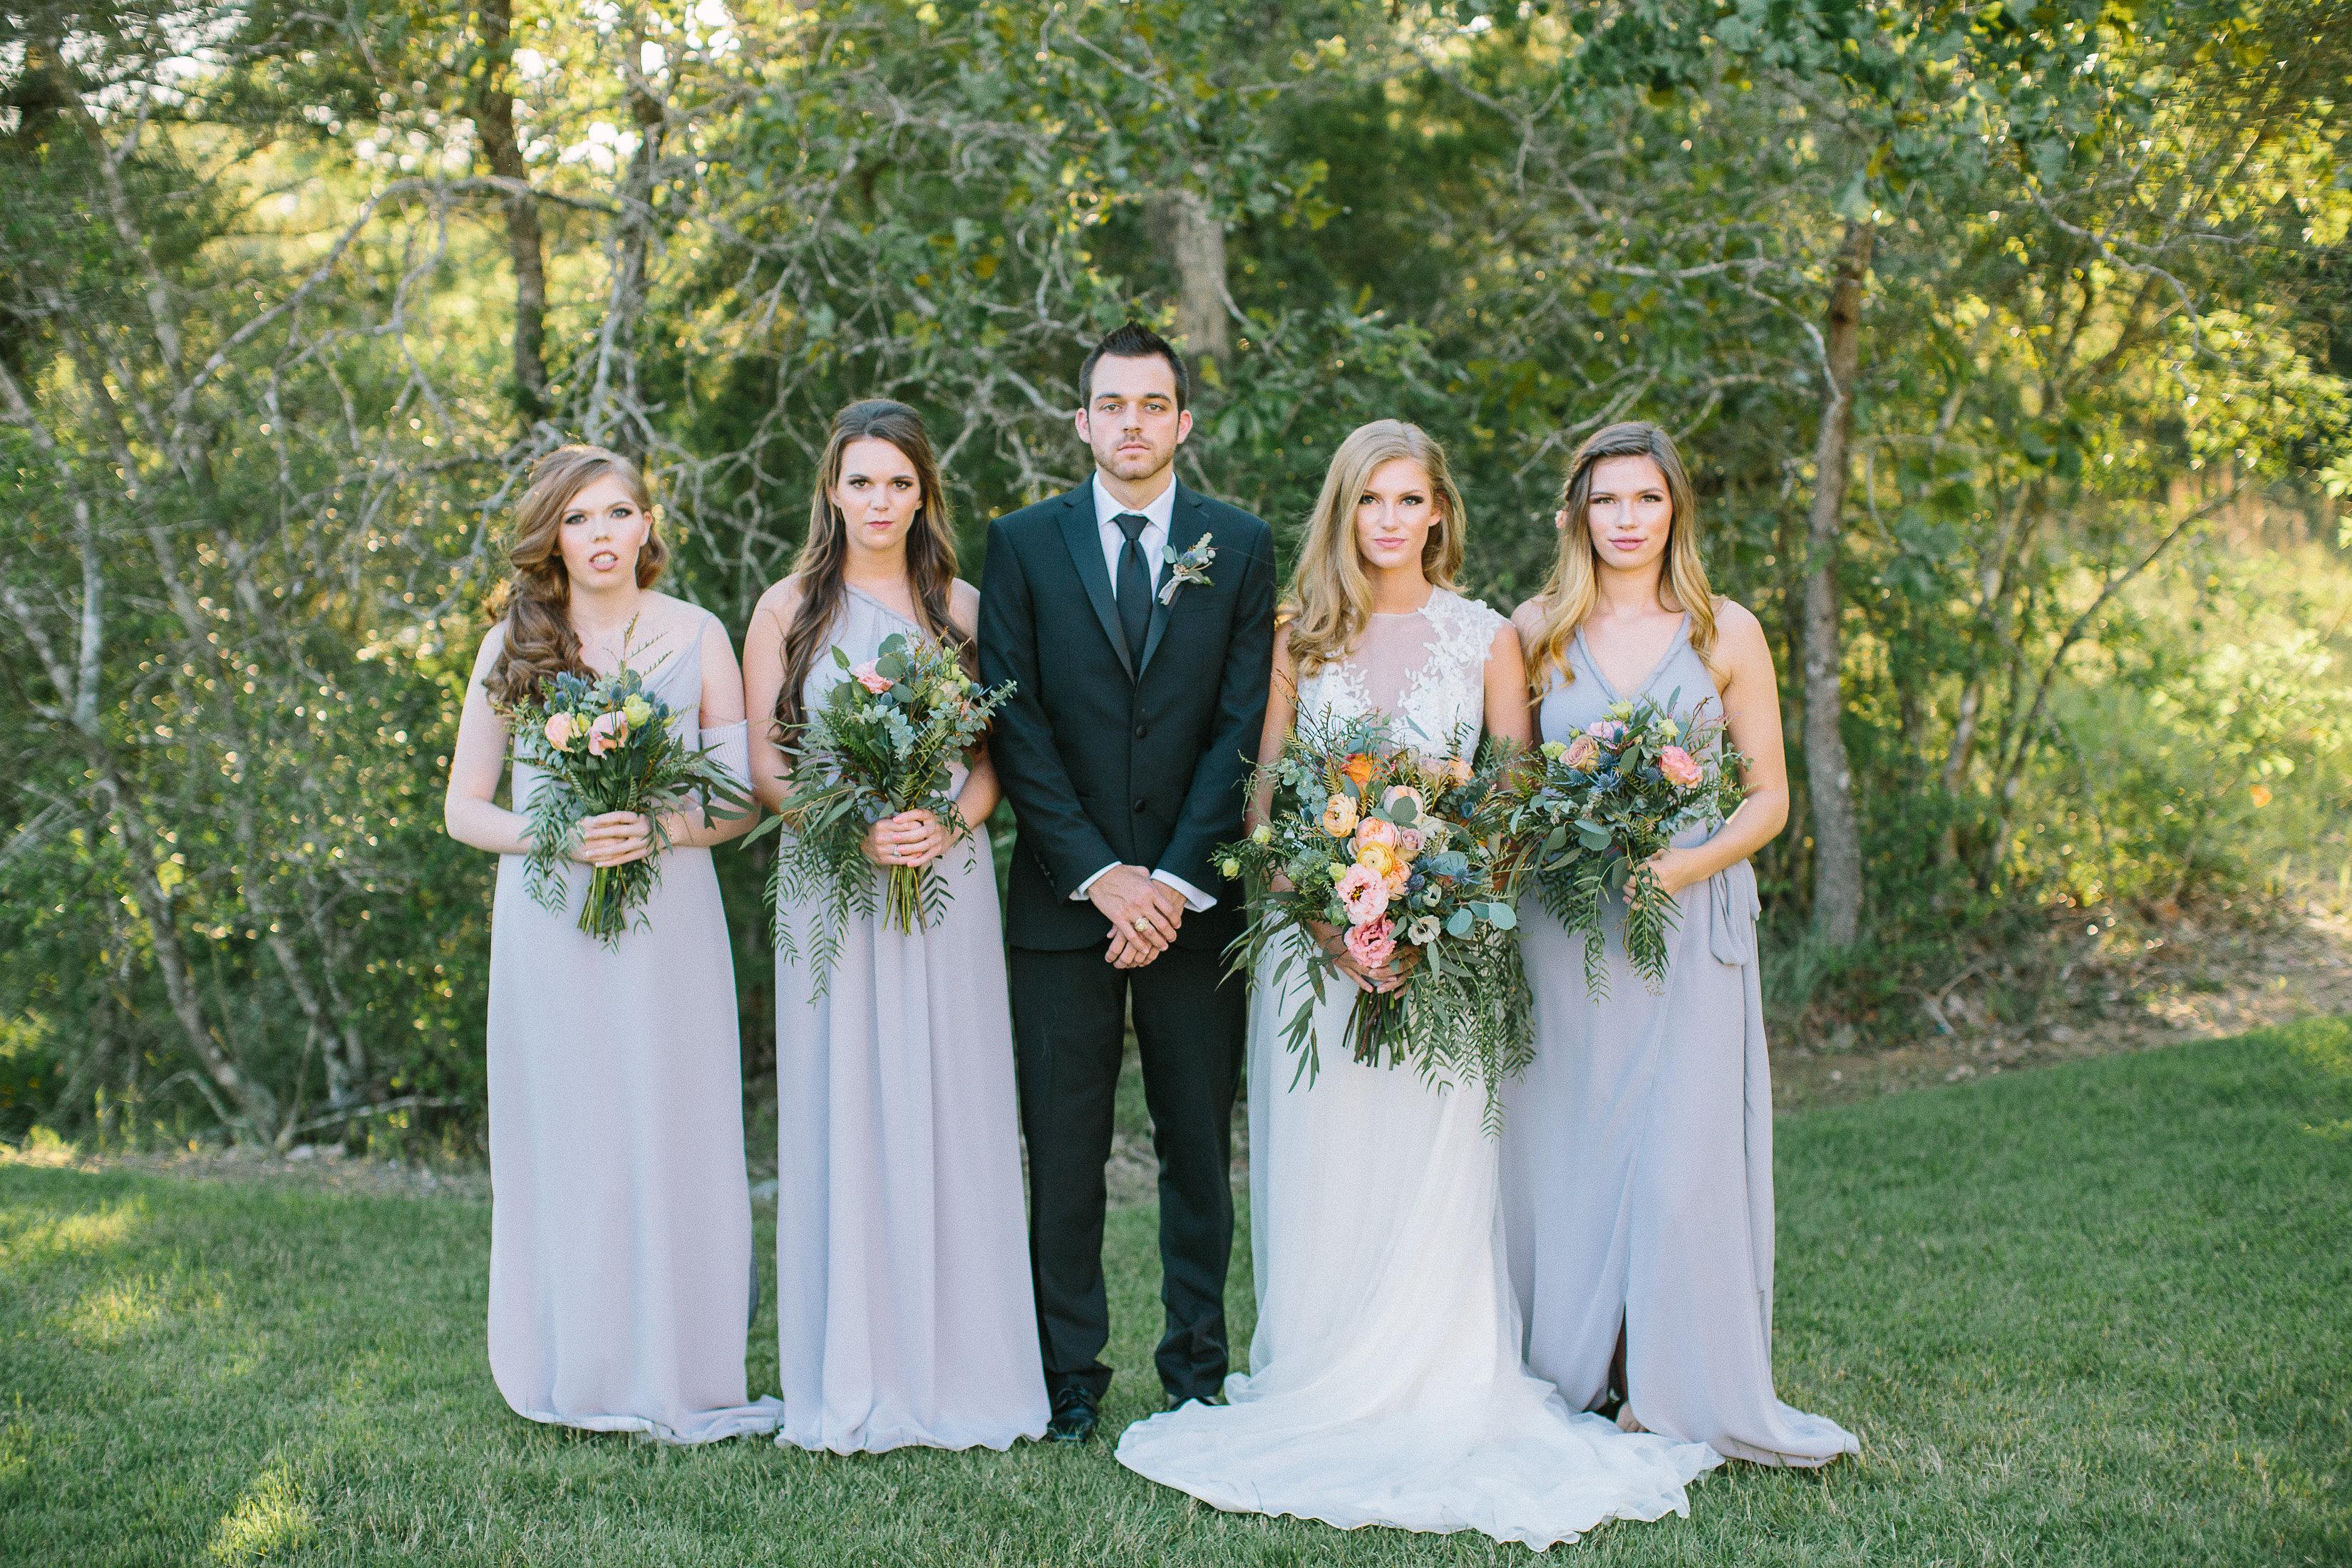 Ellen-Ashton-Photography-Peach-Creek-Ranch-Weddings-Wed-and-Prosper245